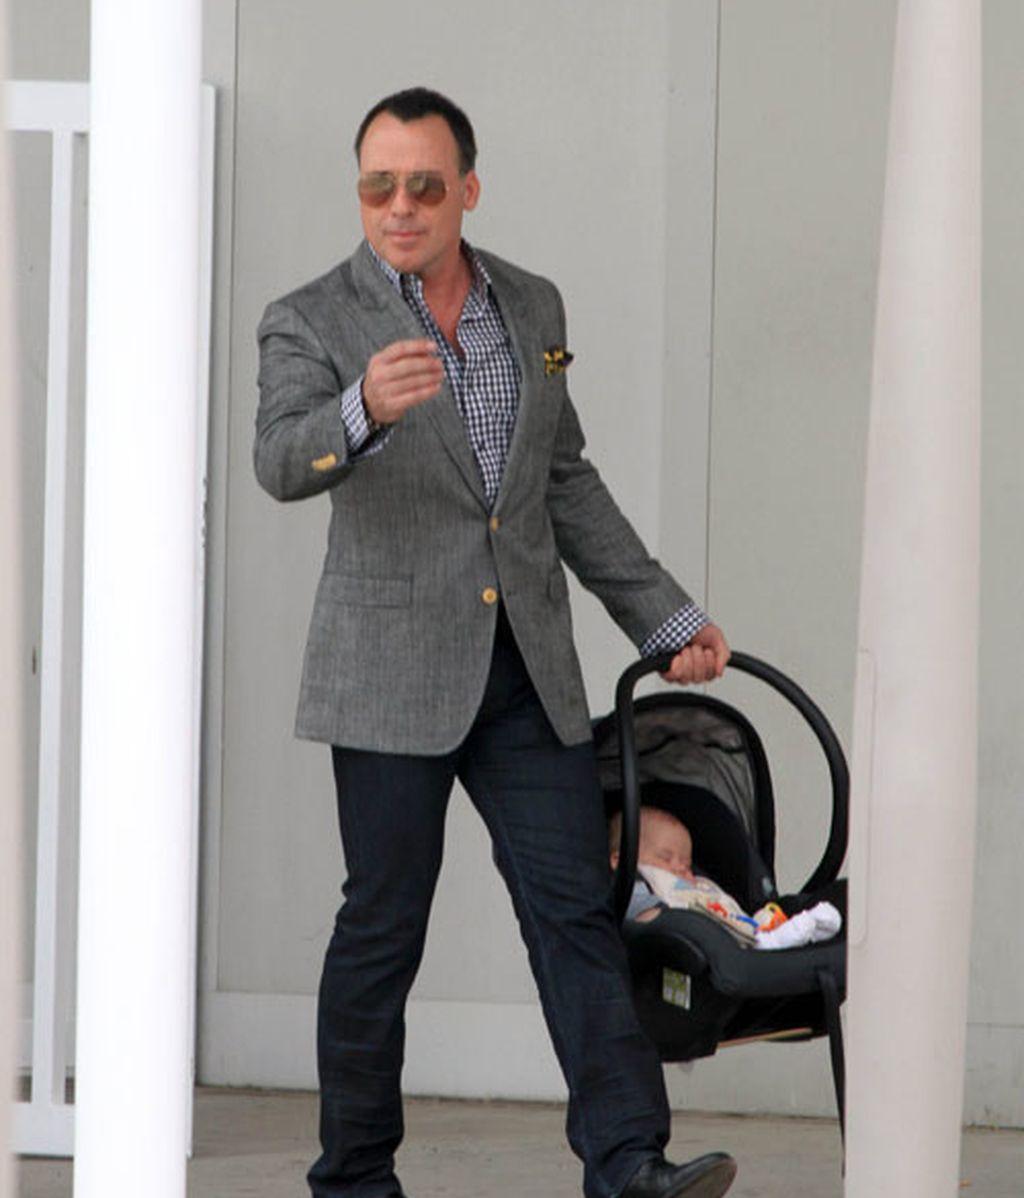 Zach, el bebé viajero de Elton John